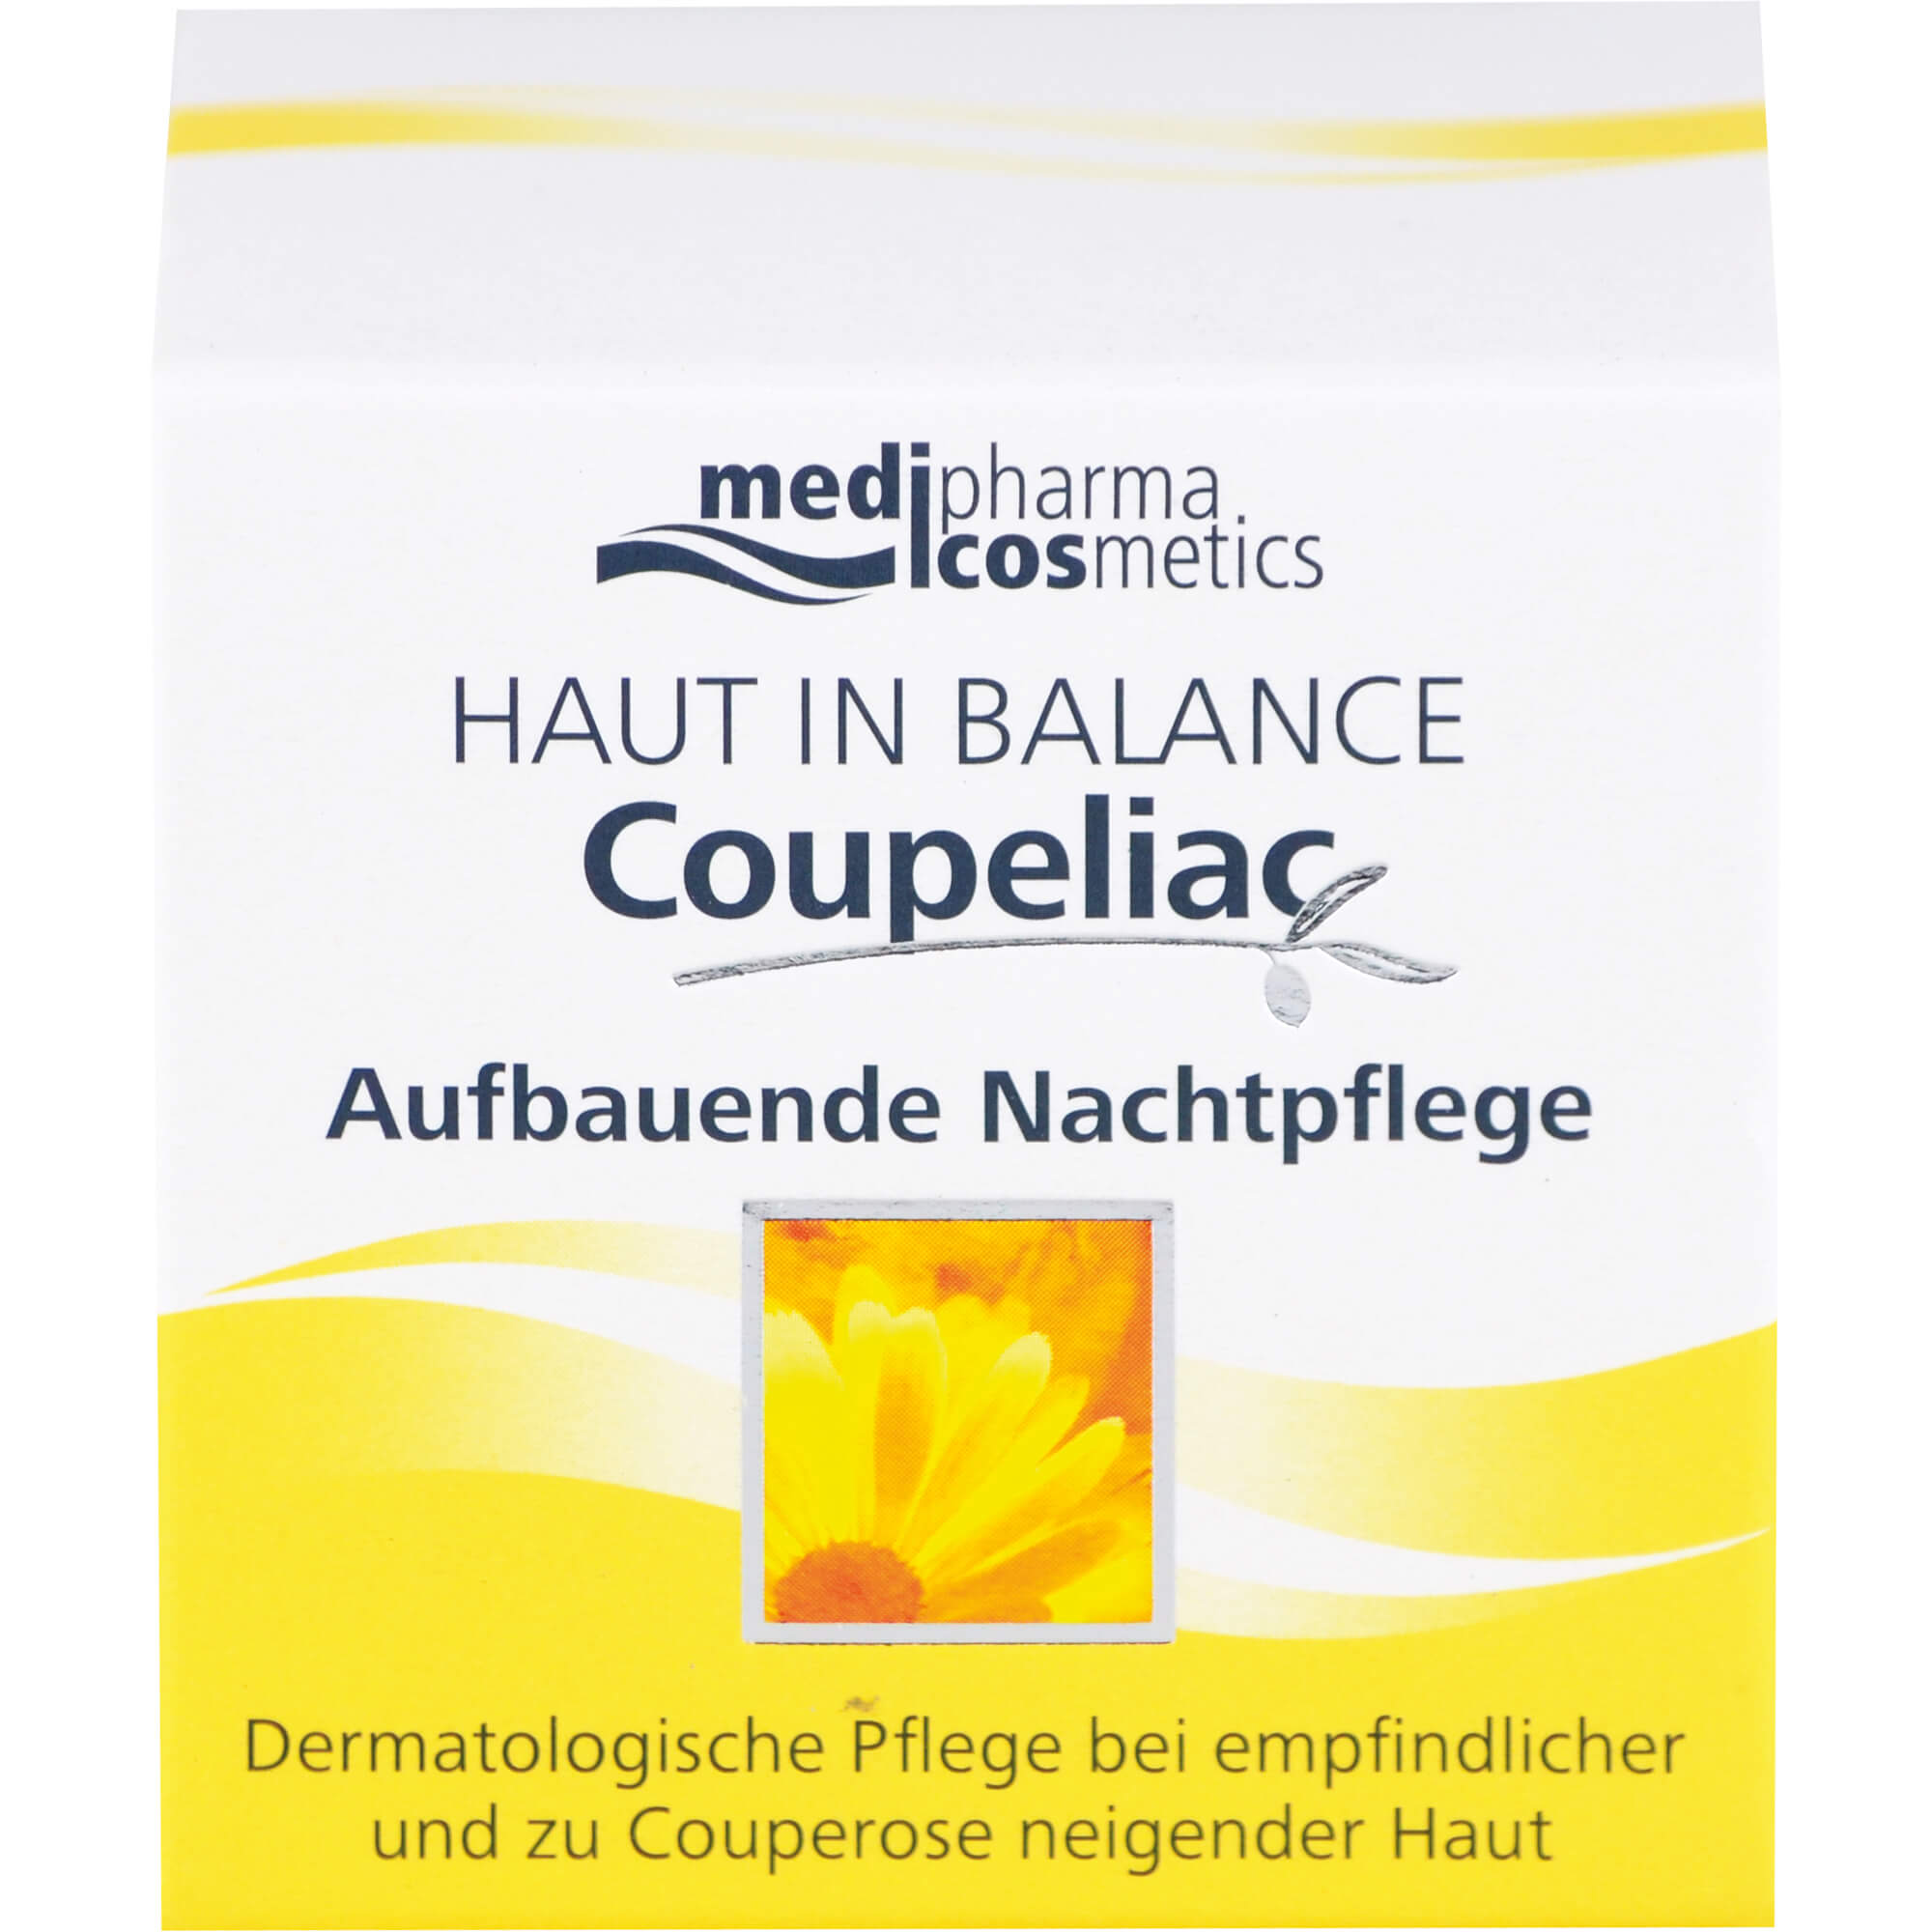 HAUT-IN-BALANCE-Coupeliac-aufbauende-Nachtpflege